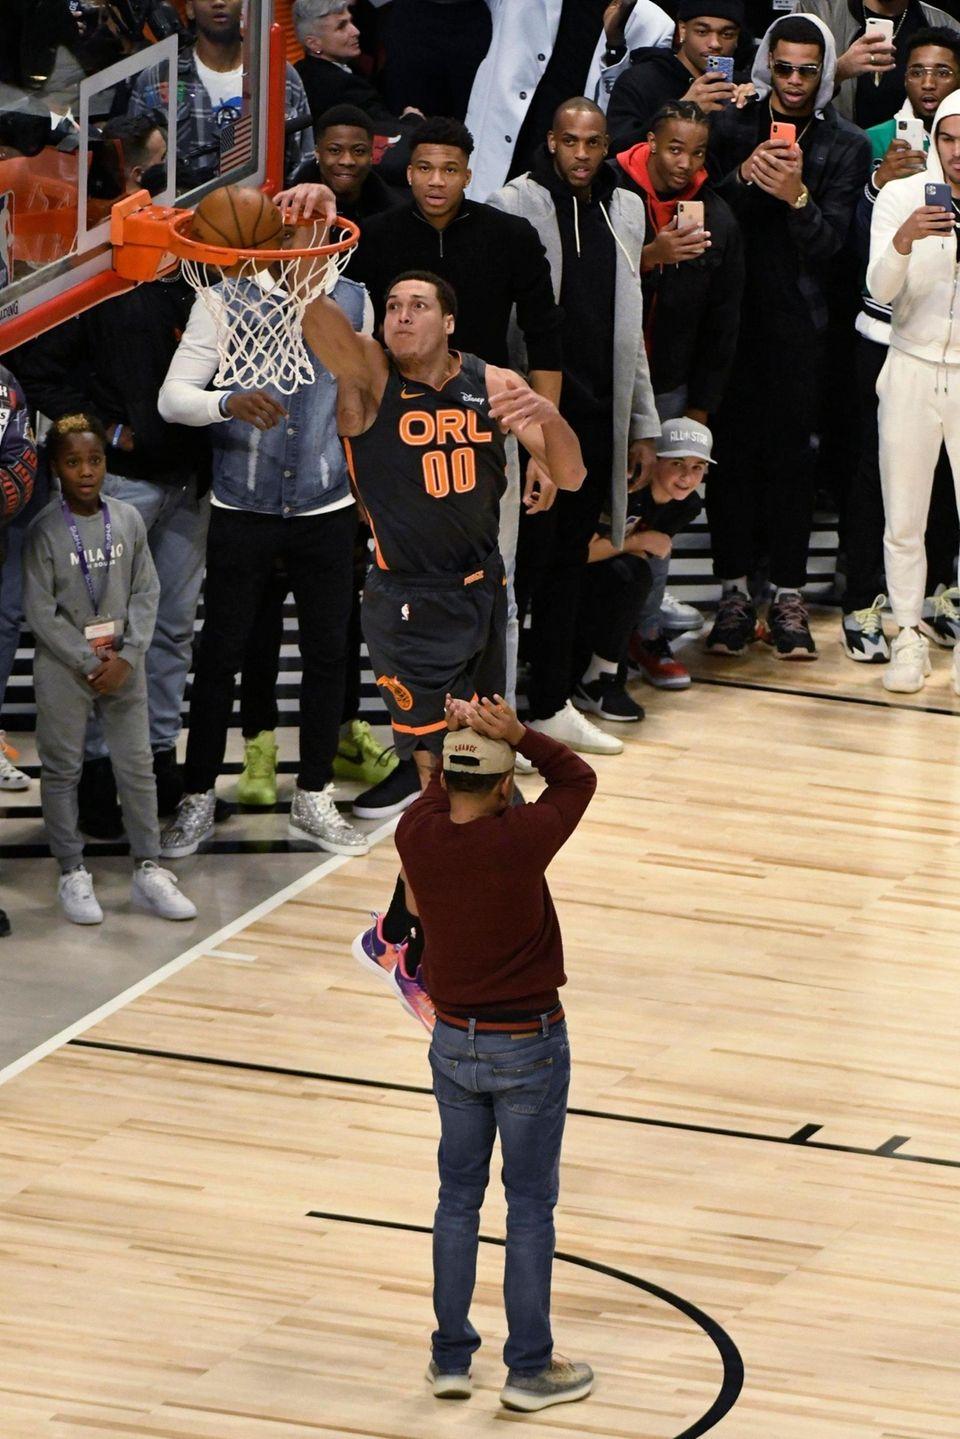 Orlando Magic's Aaron Gordon dunks over Chance the